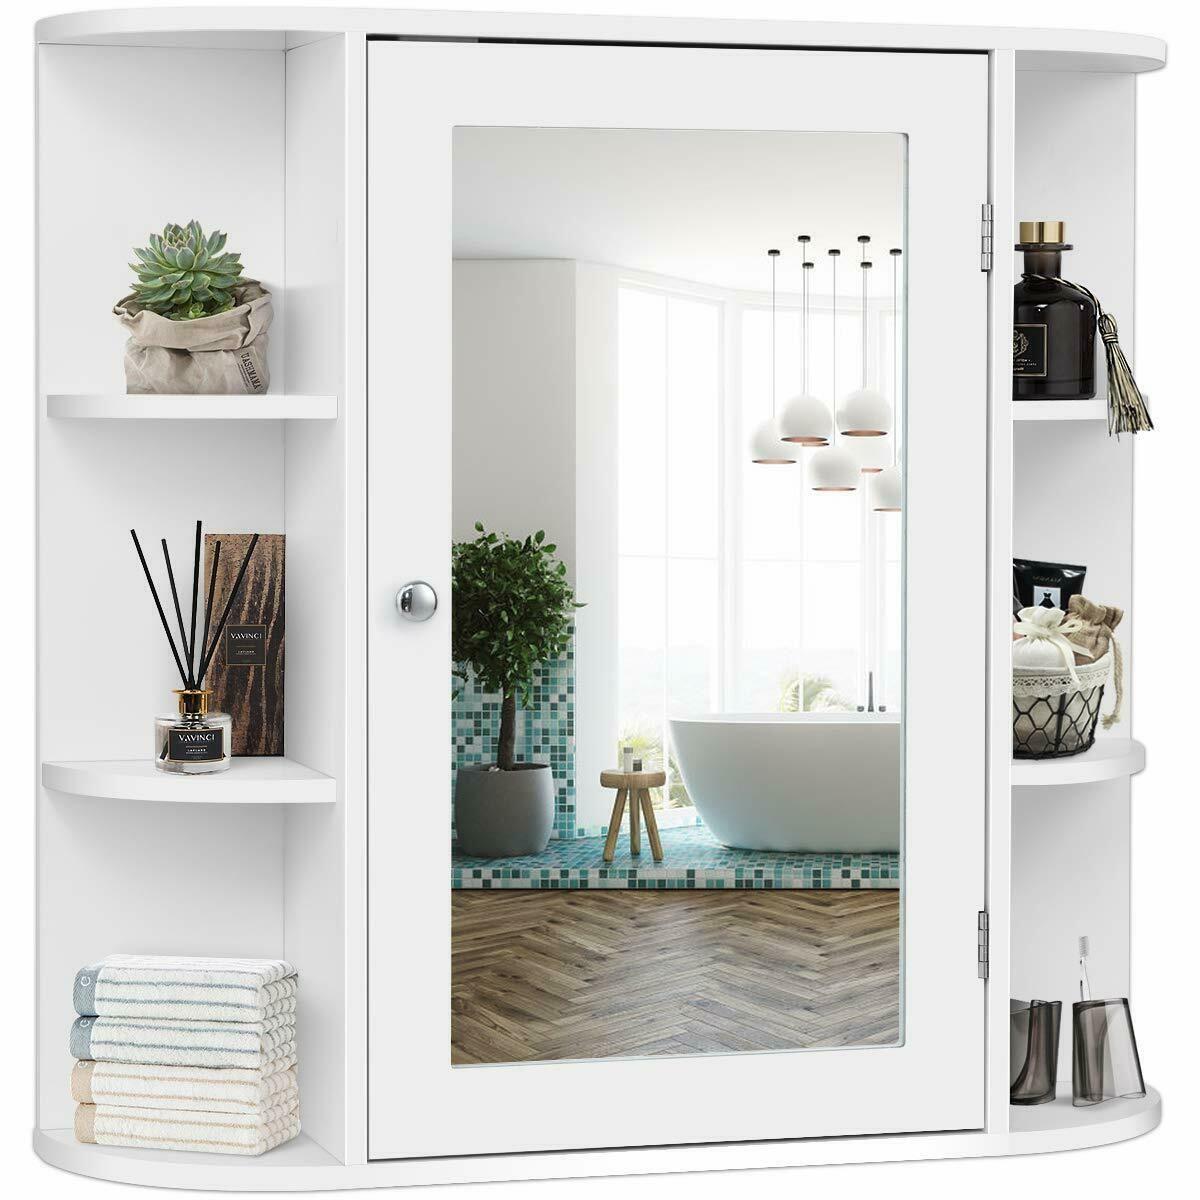 Costway Multipurpose Wall Surface Bathroom Storage Medicine Cabinet With Mirror White Walmart Com In 2020 Bathroom Wall Cabinets Wall Mounted Medicine Cabinet Bathroom Mirror Cabinet